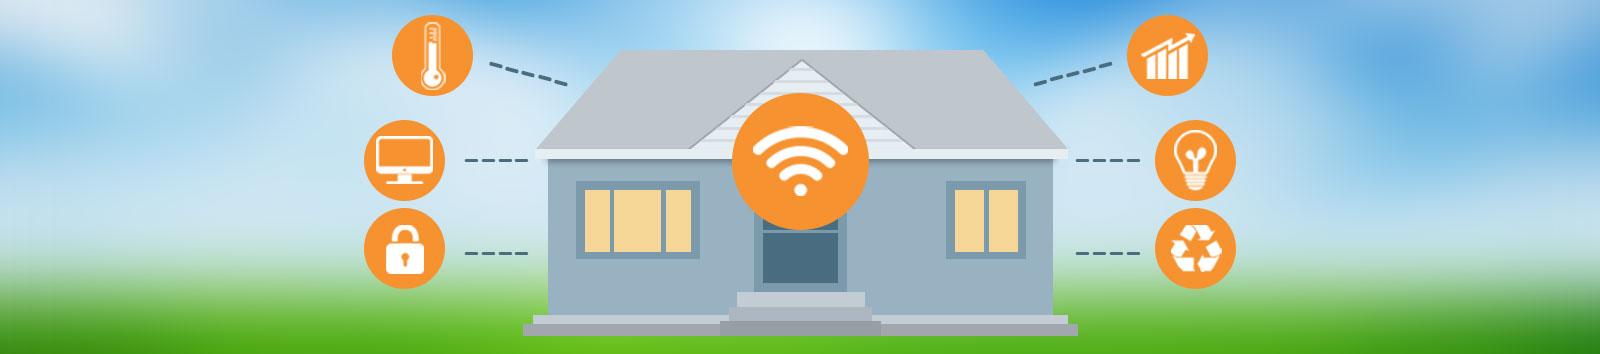 Building A Smart Home